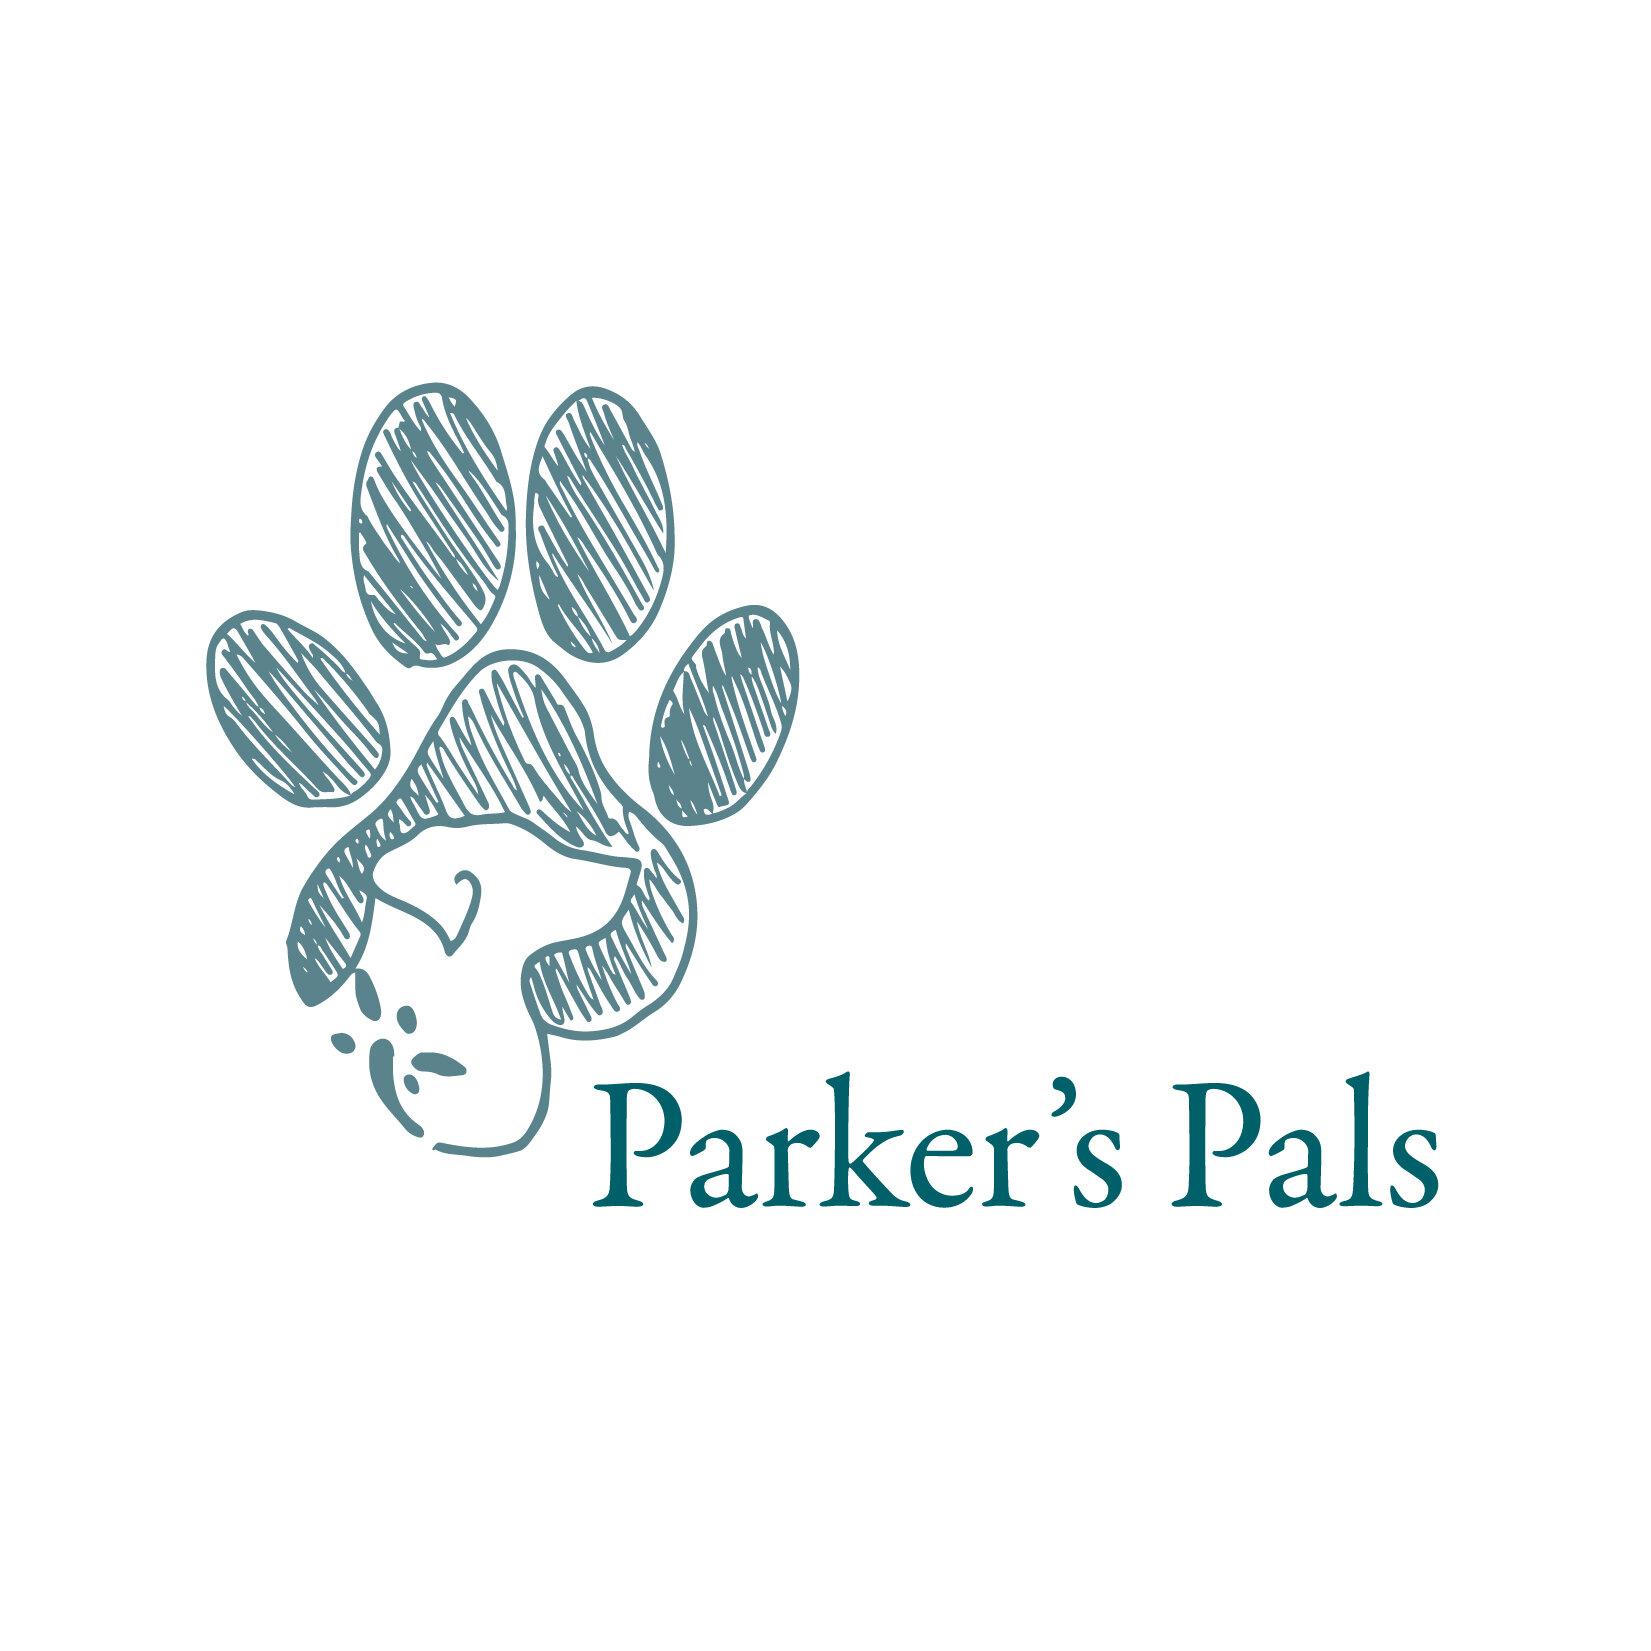 ParkersPals_Logo1-06.jpg